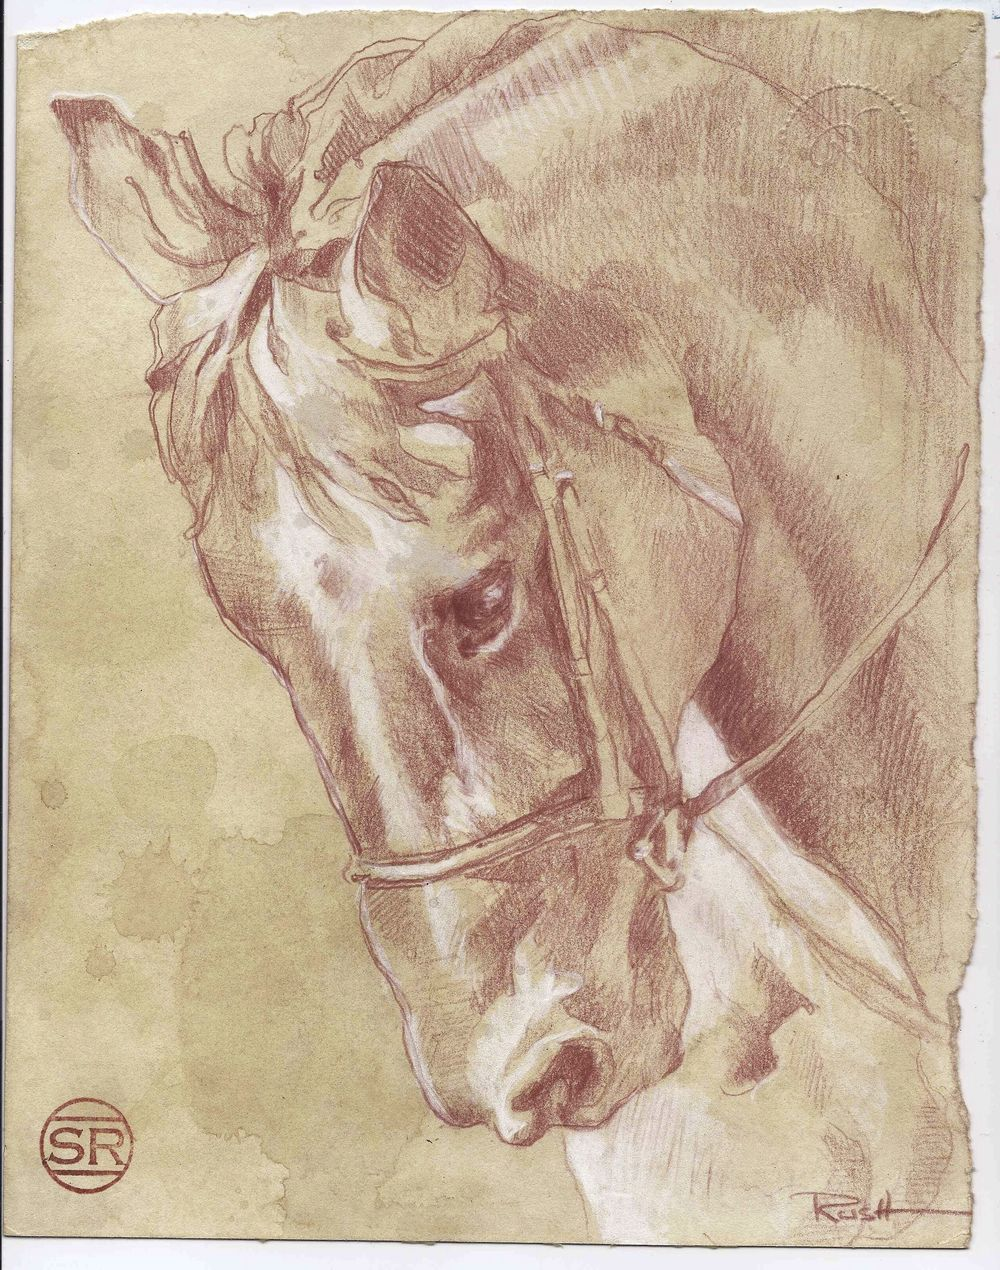 Thunder Sketch